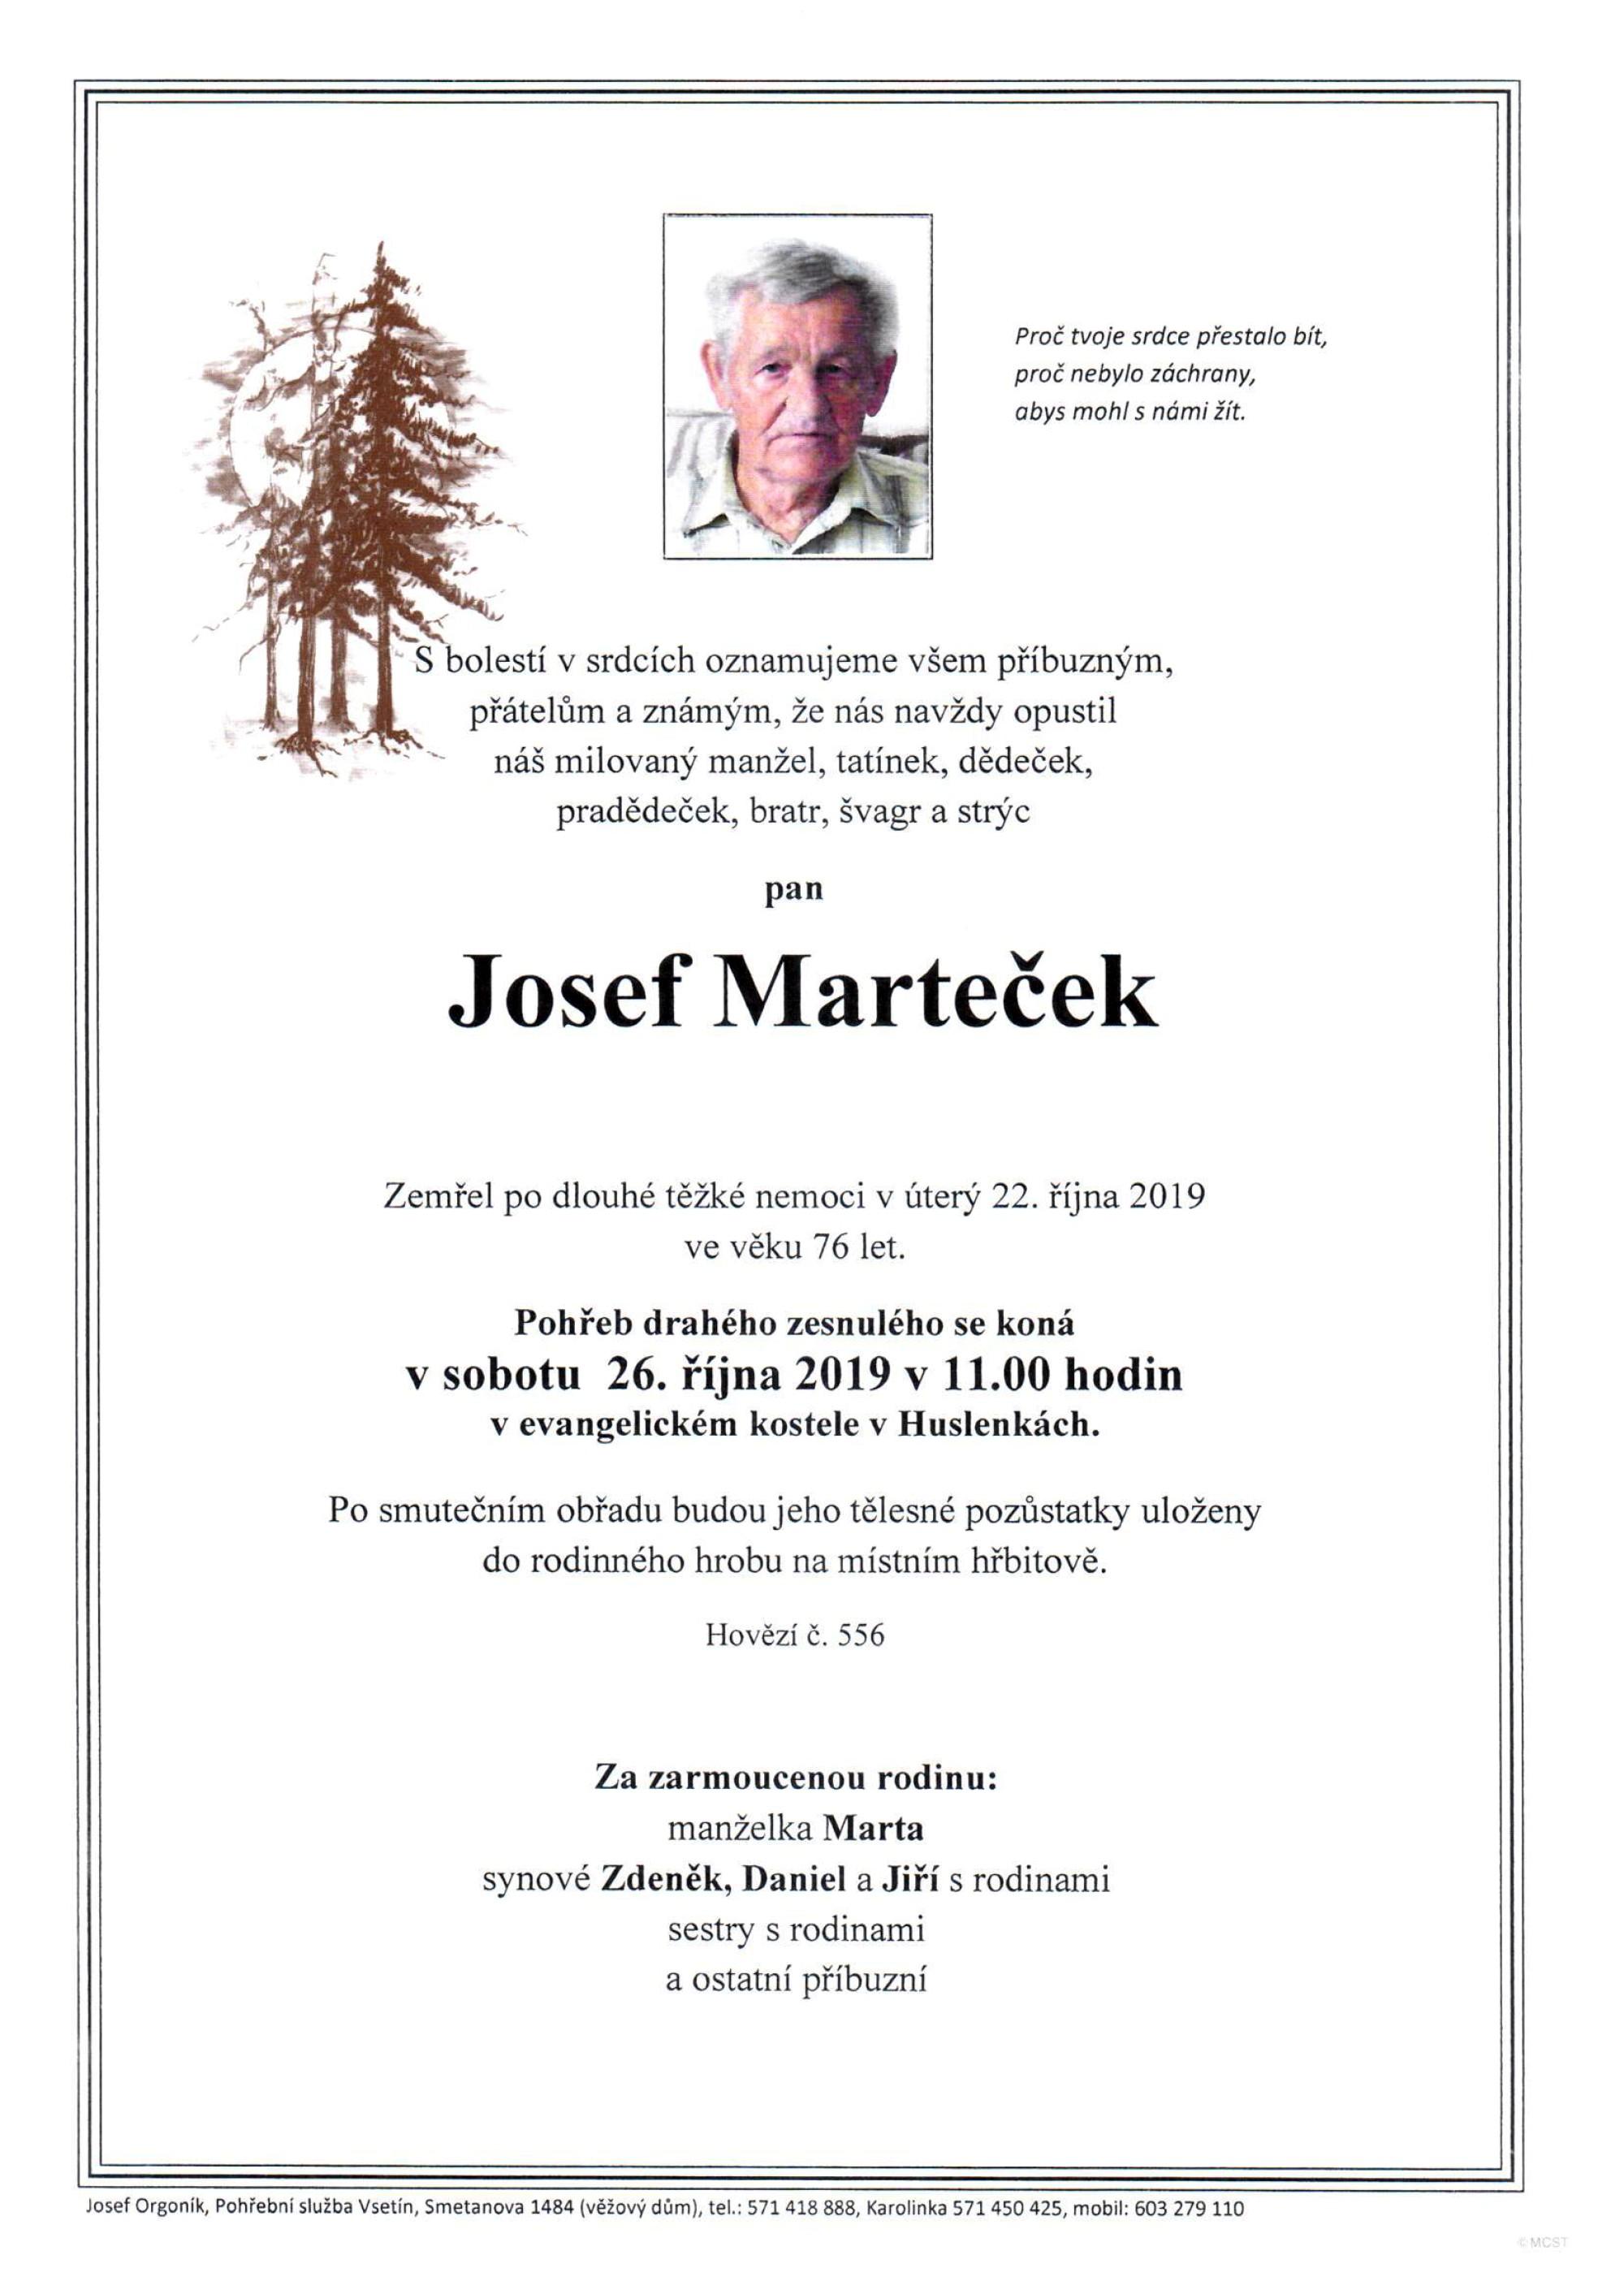 Josef Marteček